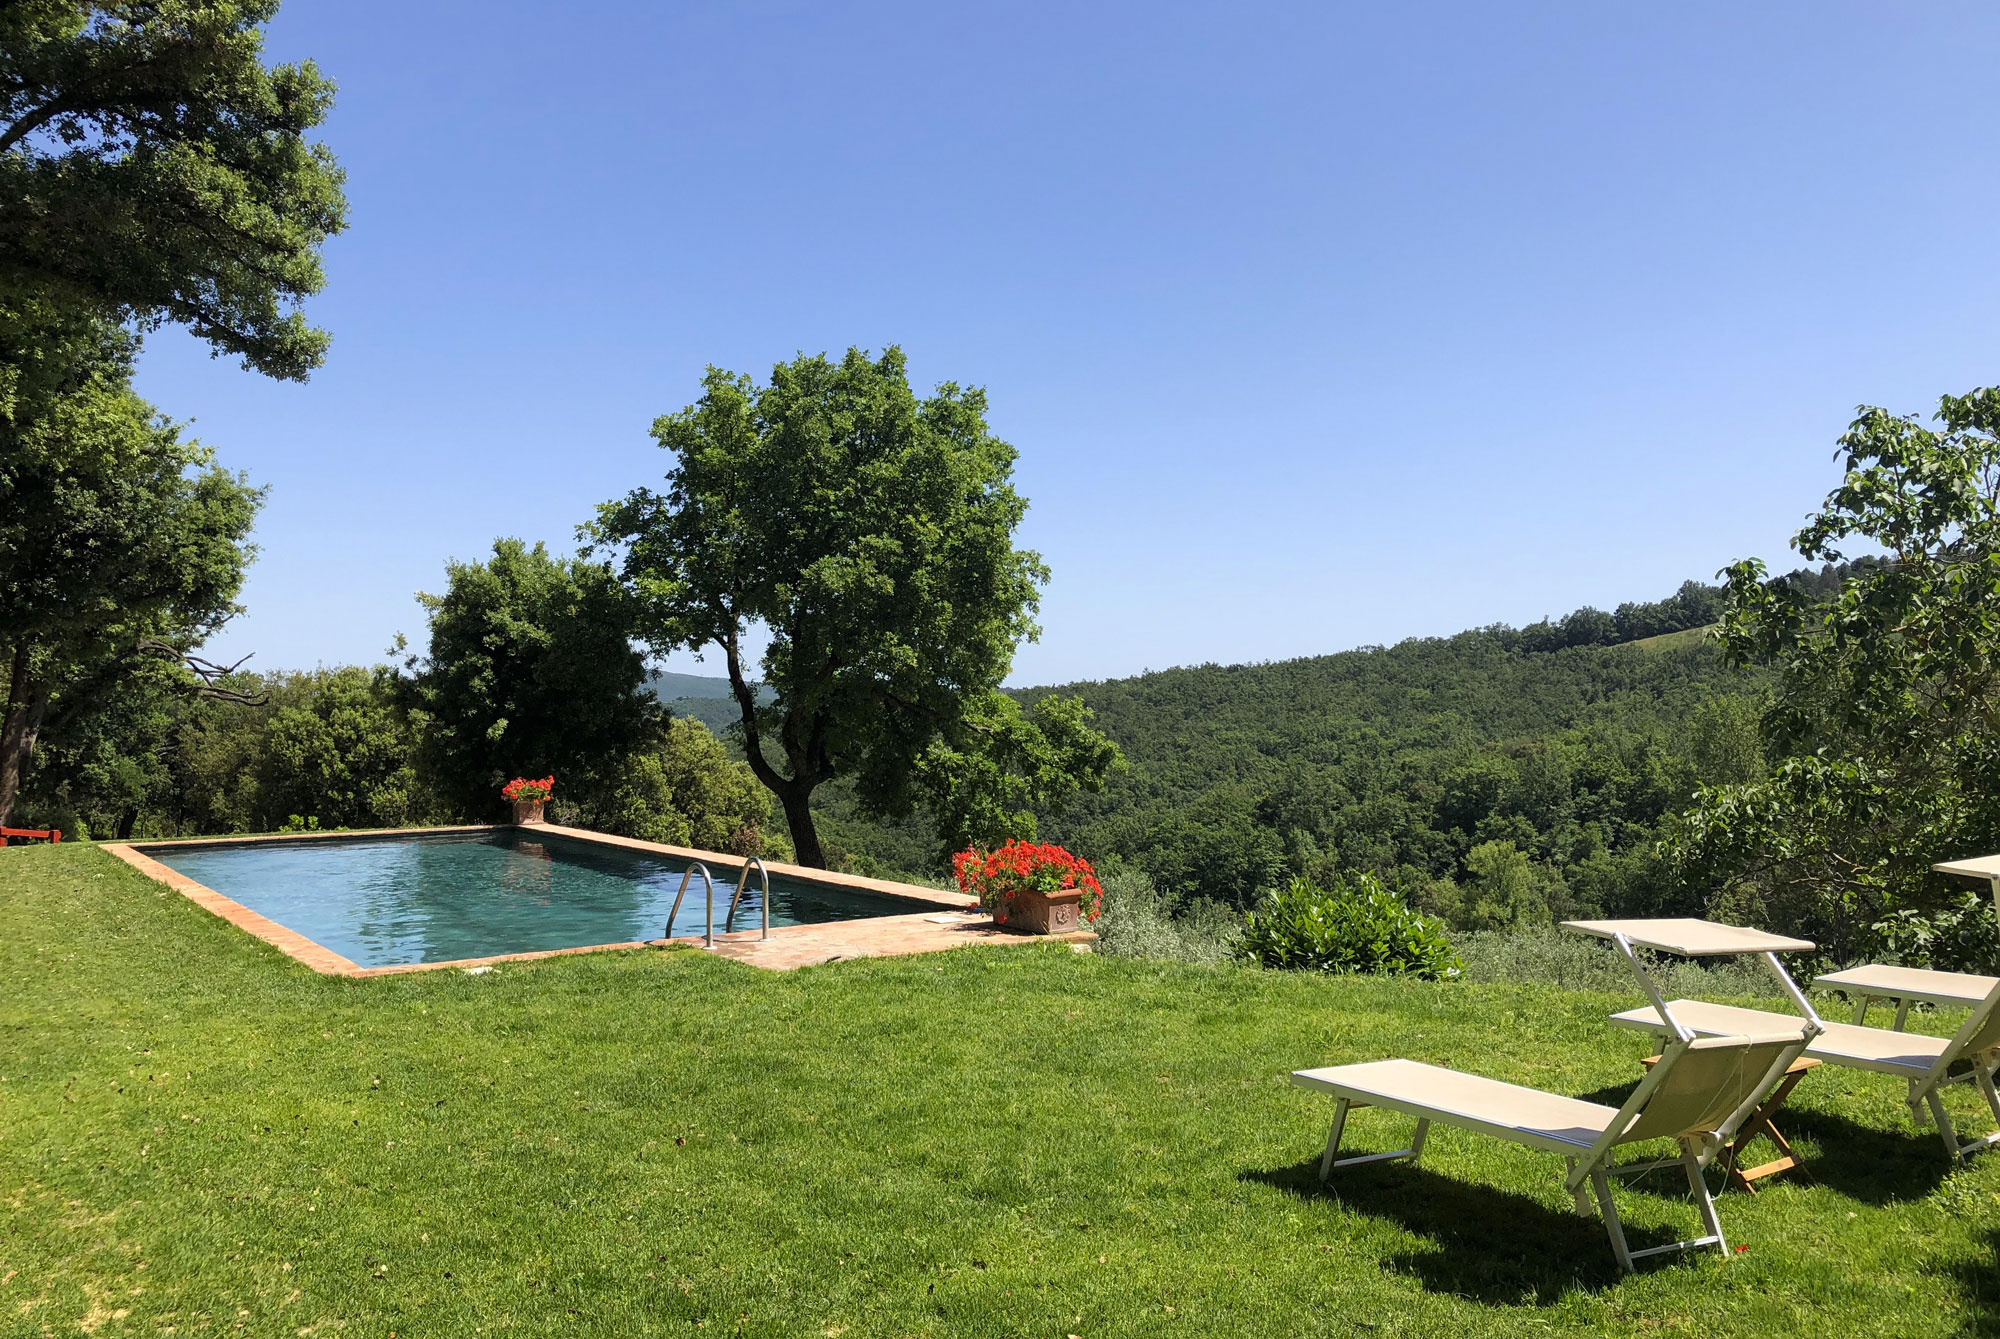 http://www.villalasciolta.it/wp-content/uploads/2016/02/villa-la-sciolta-tuscany6-1.jpg